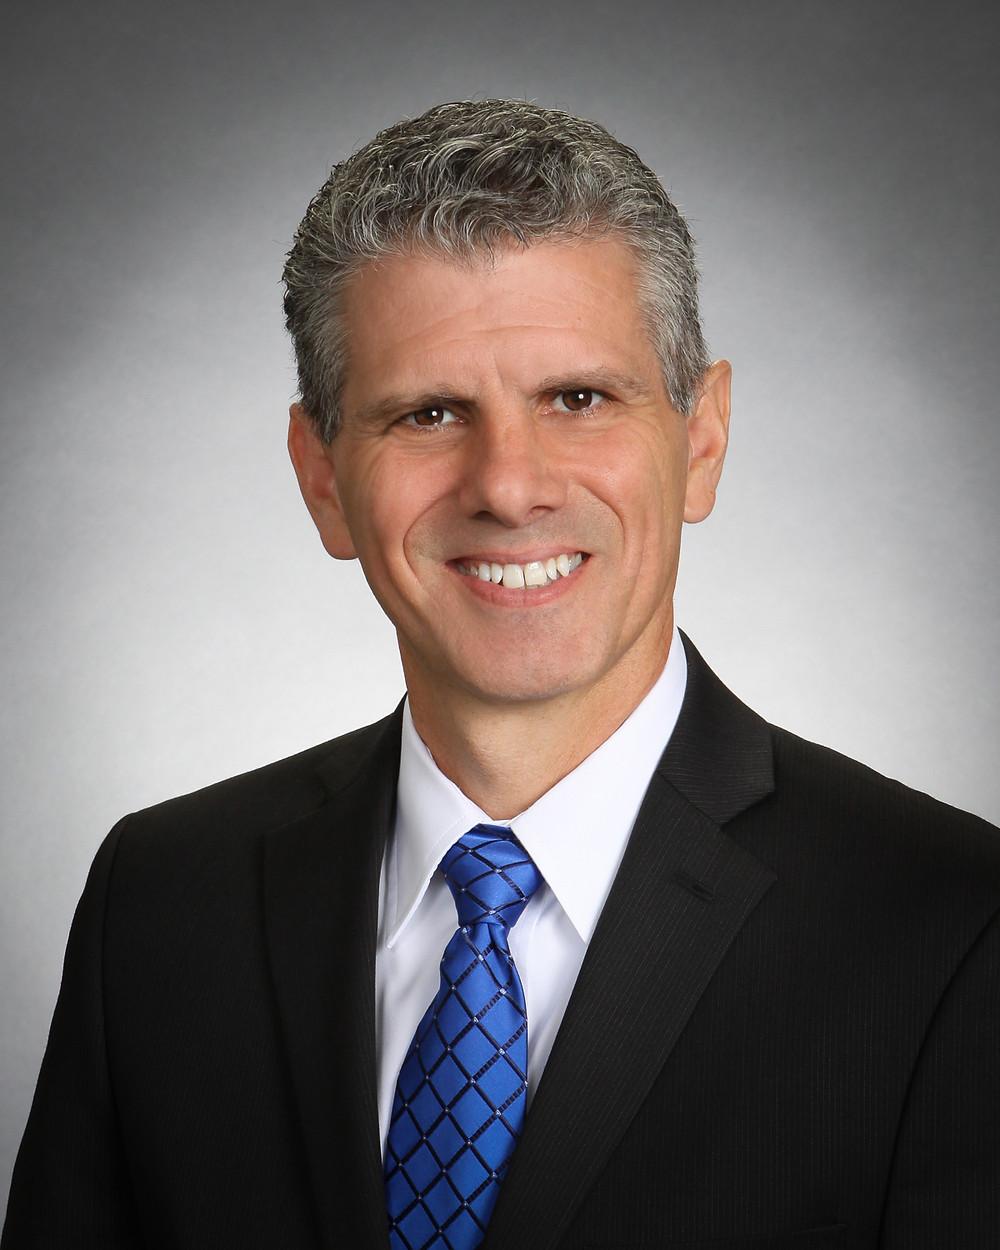 Dr. Rob Haworth, Superintendent, Vigo County School Corp.